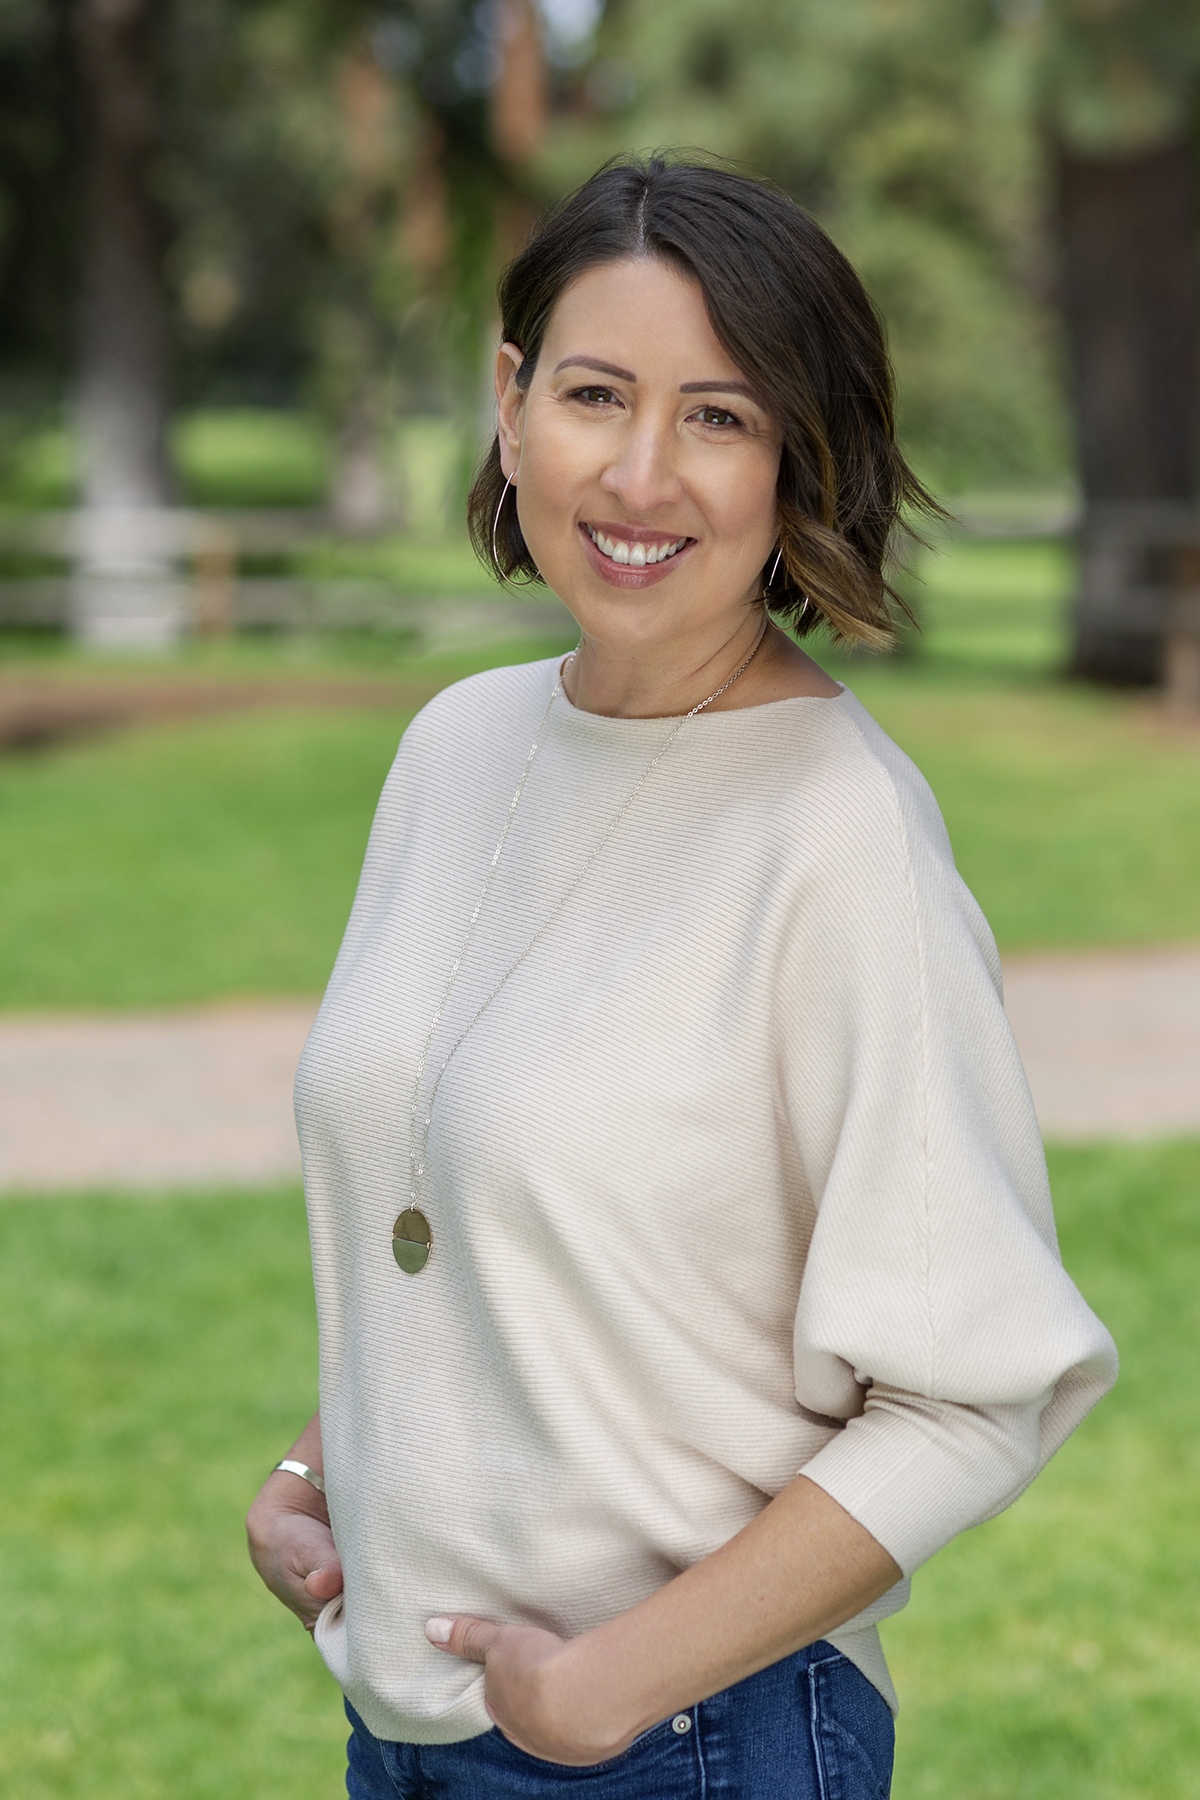 Valerie Yost